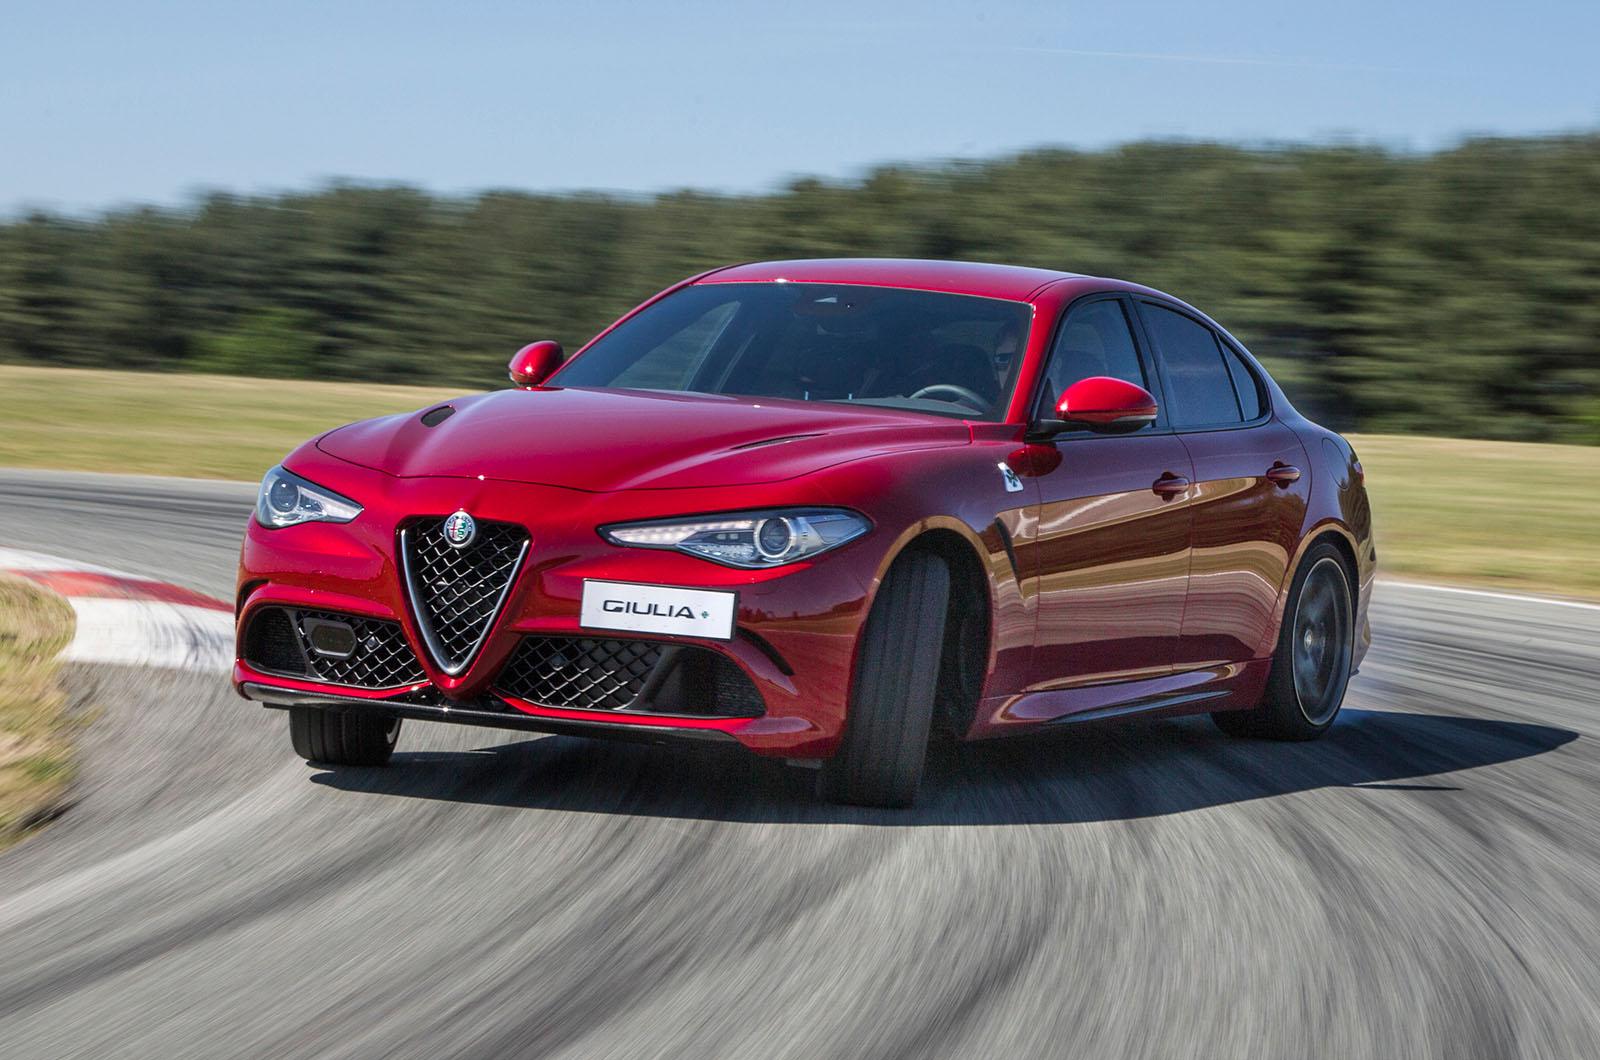 2016 Alfa Romeo Giulia Quadrifoglio First Drive Review Autocar Rear End